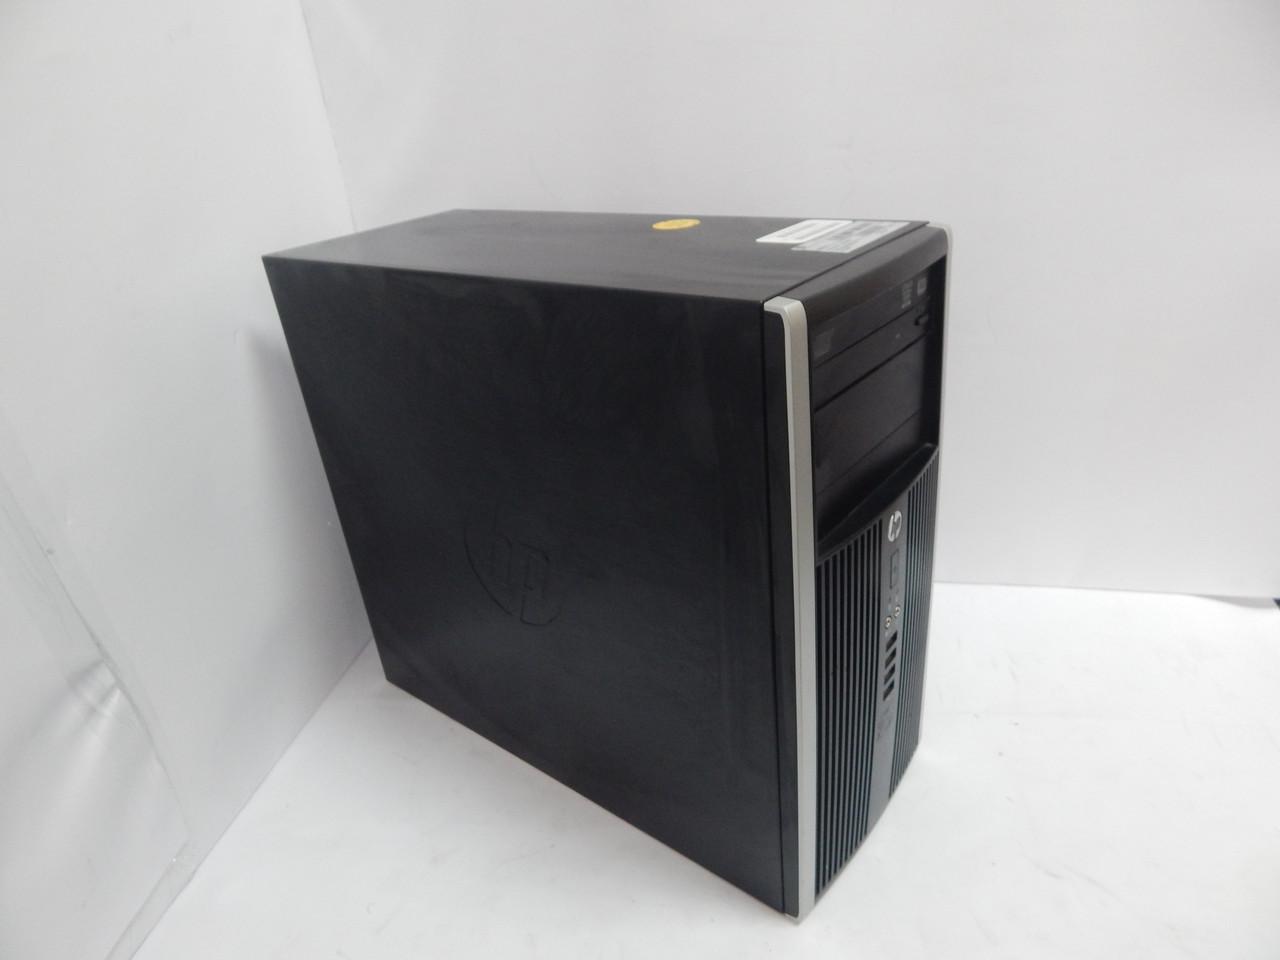 Системный блок, компьютер HP 4 ядра i5-2400, ОЗУ4 ГБ DDR3